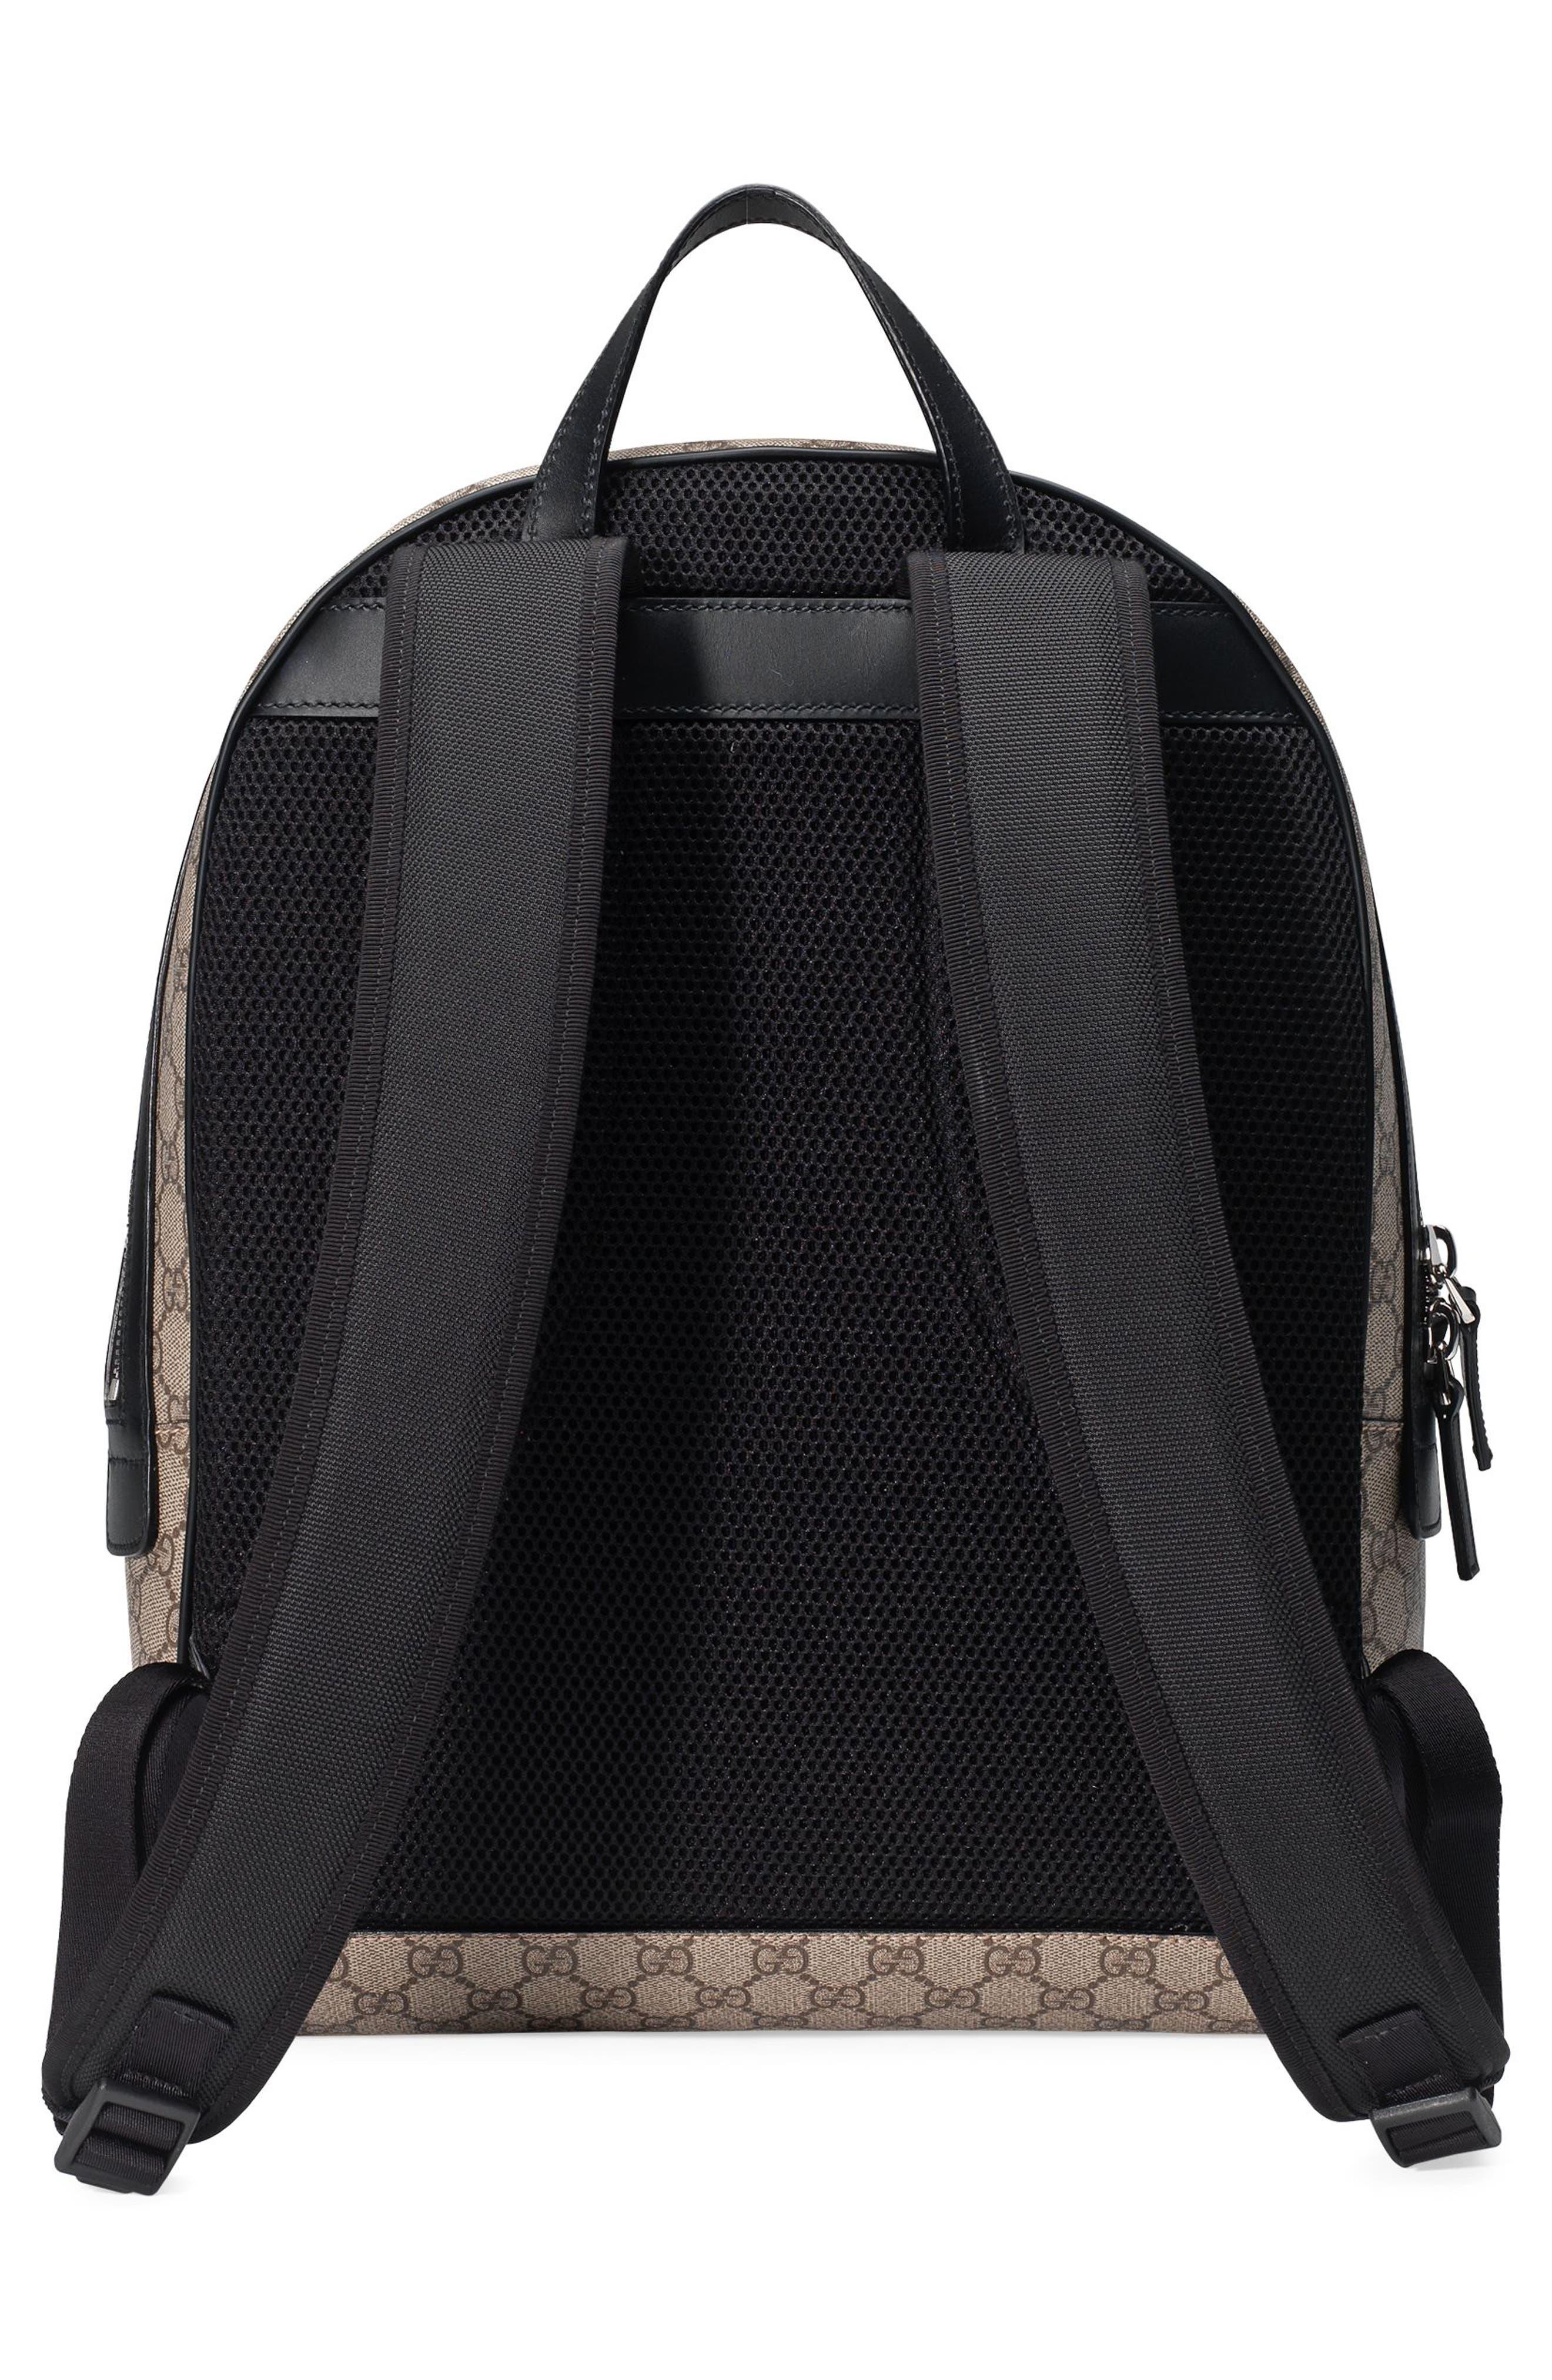 Supreme Stripe Backpack,                             Alternate thumbnail 2, color,                             283